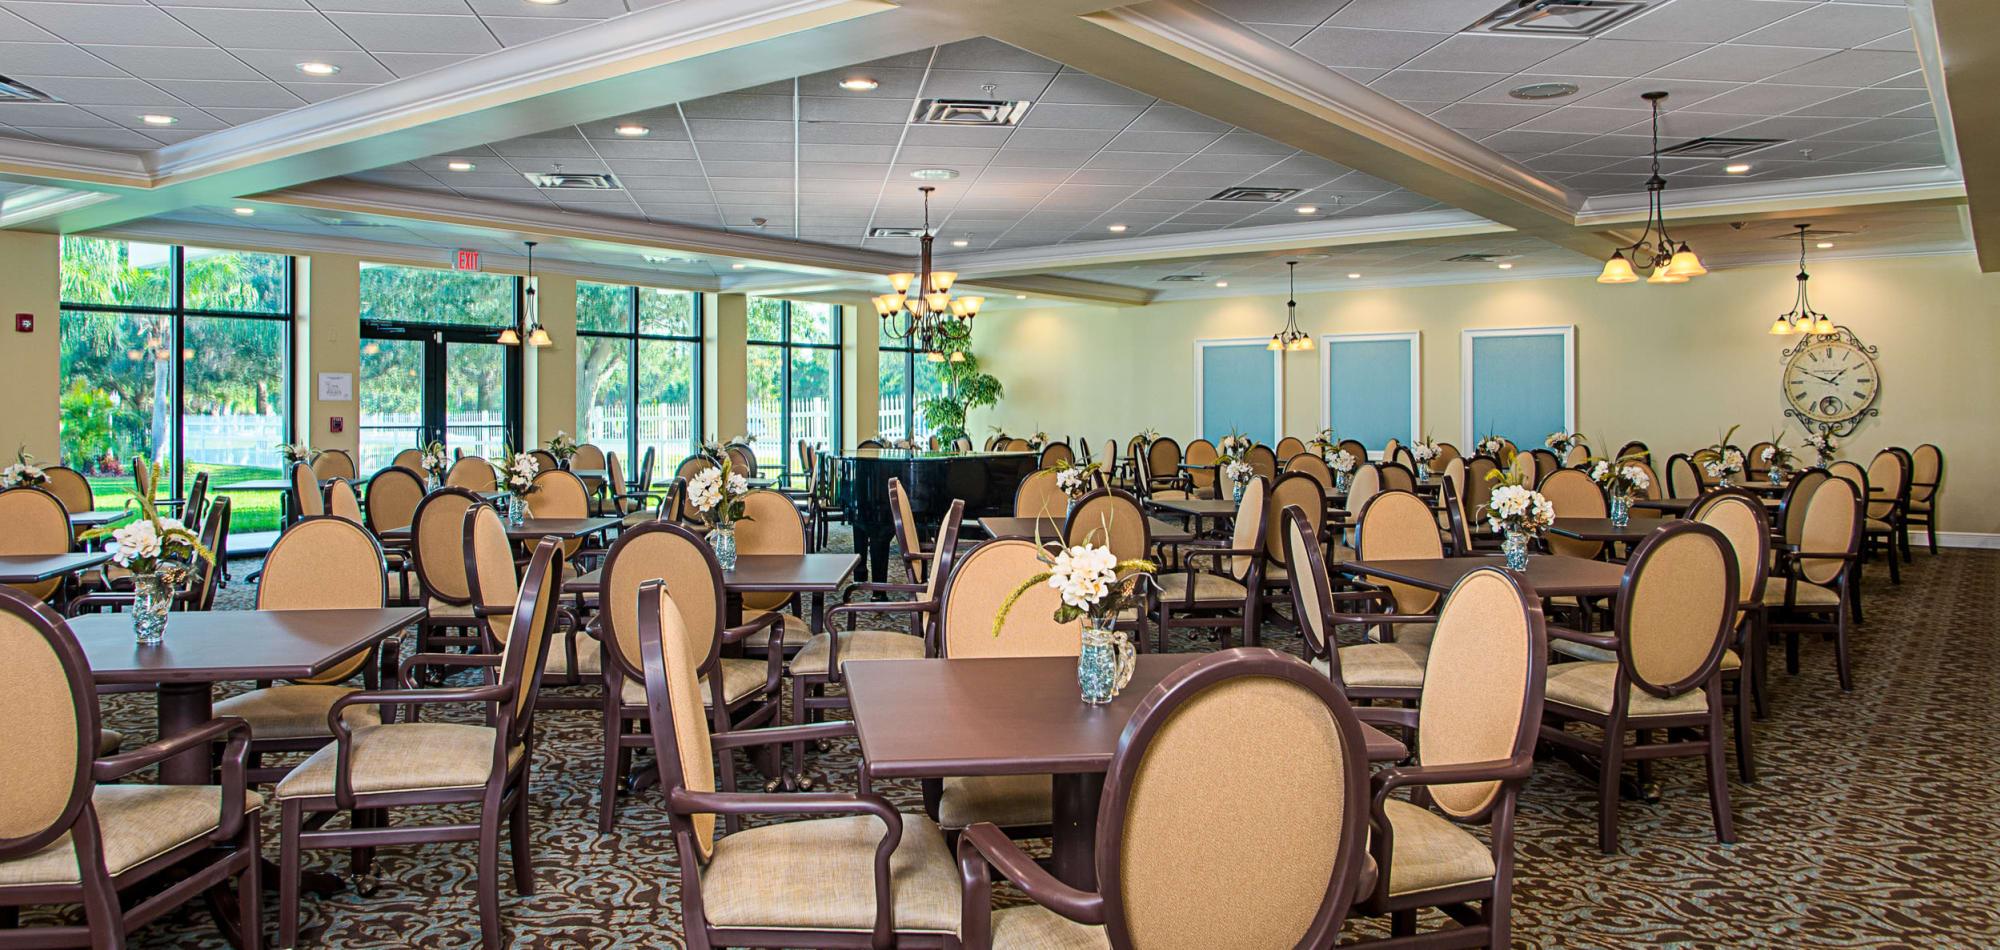 Dining at Grand Villa of St. Petersburg, Florida at Grand Villa of St. Petersburg